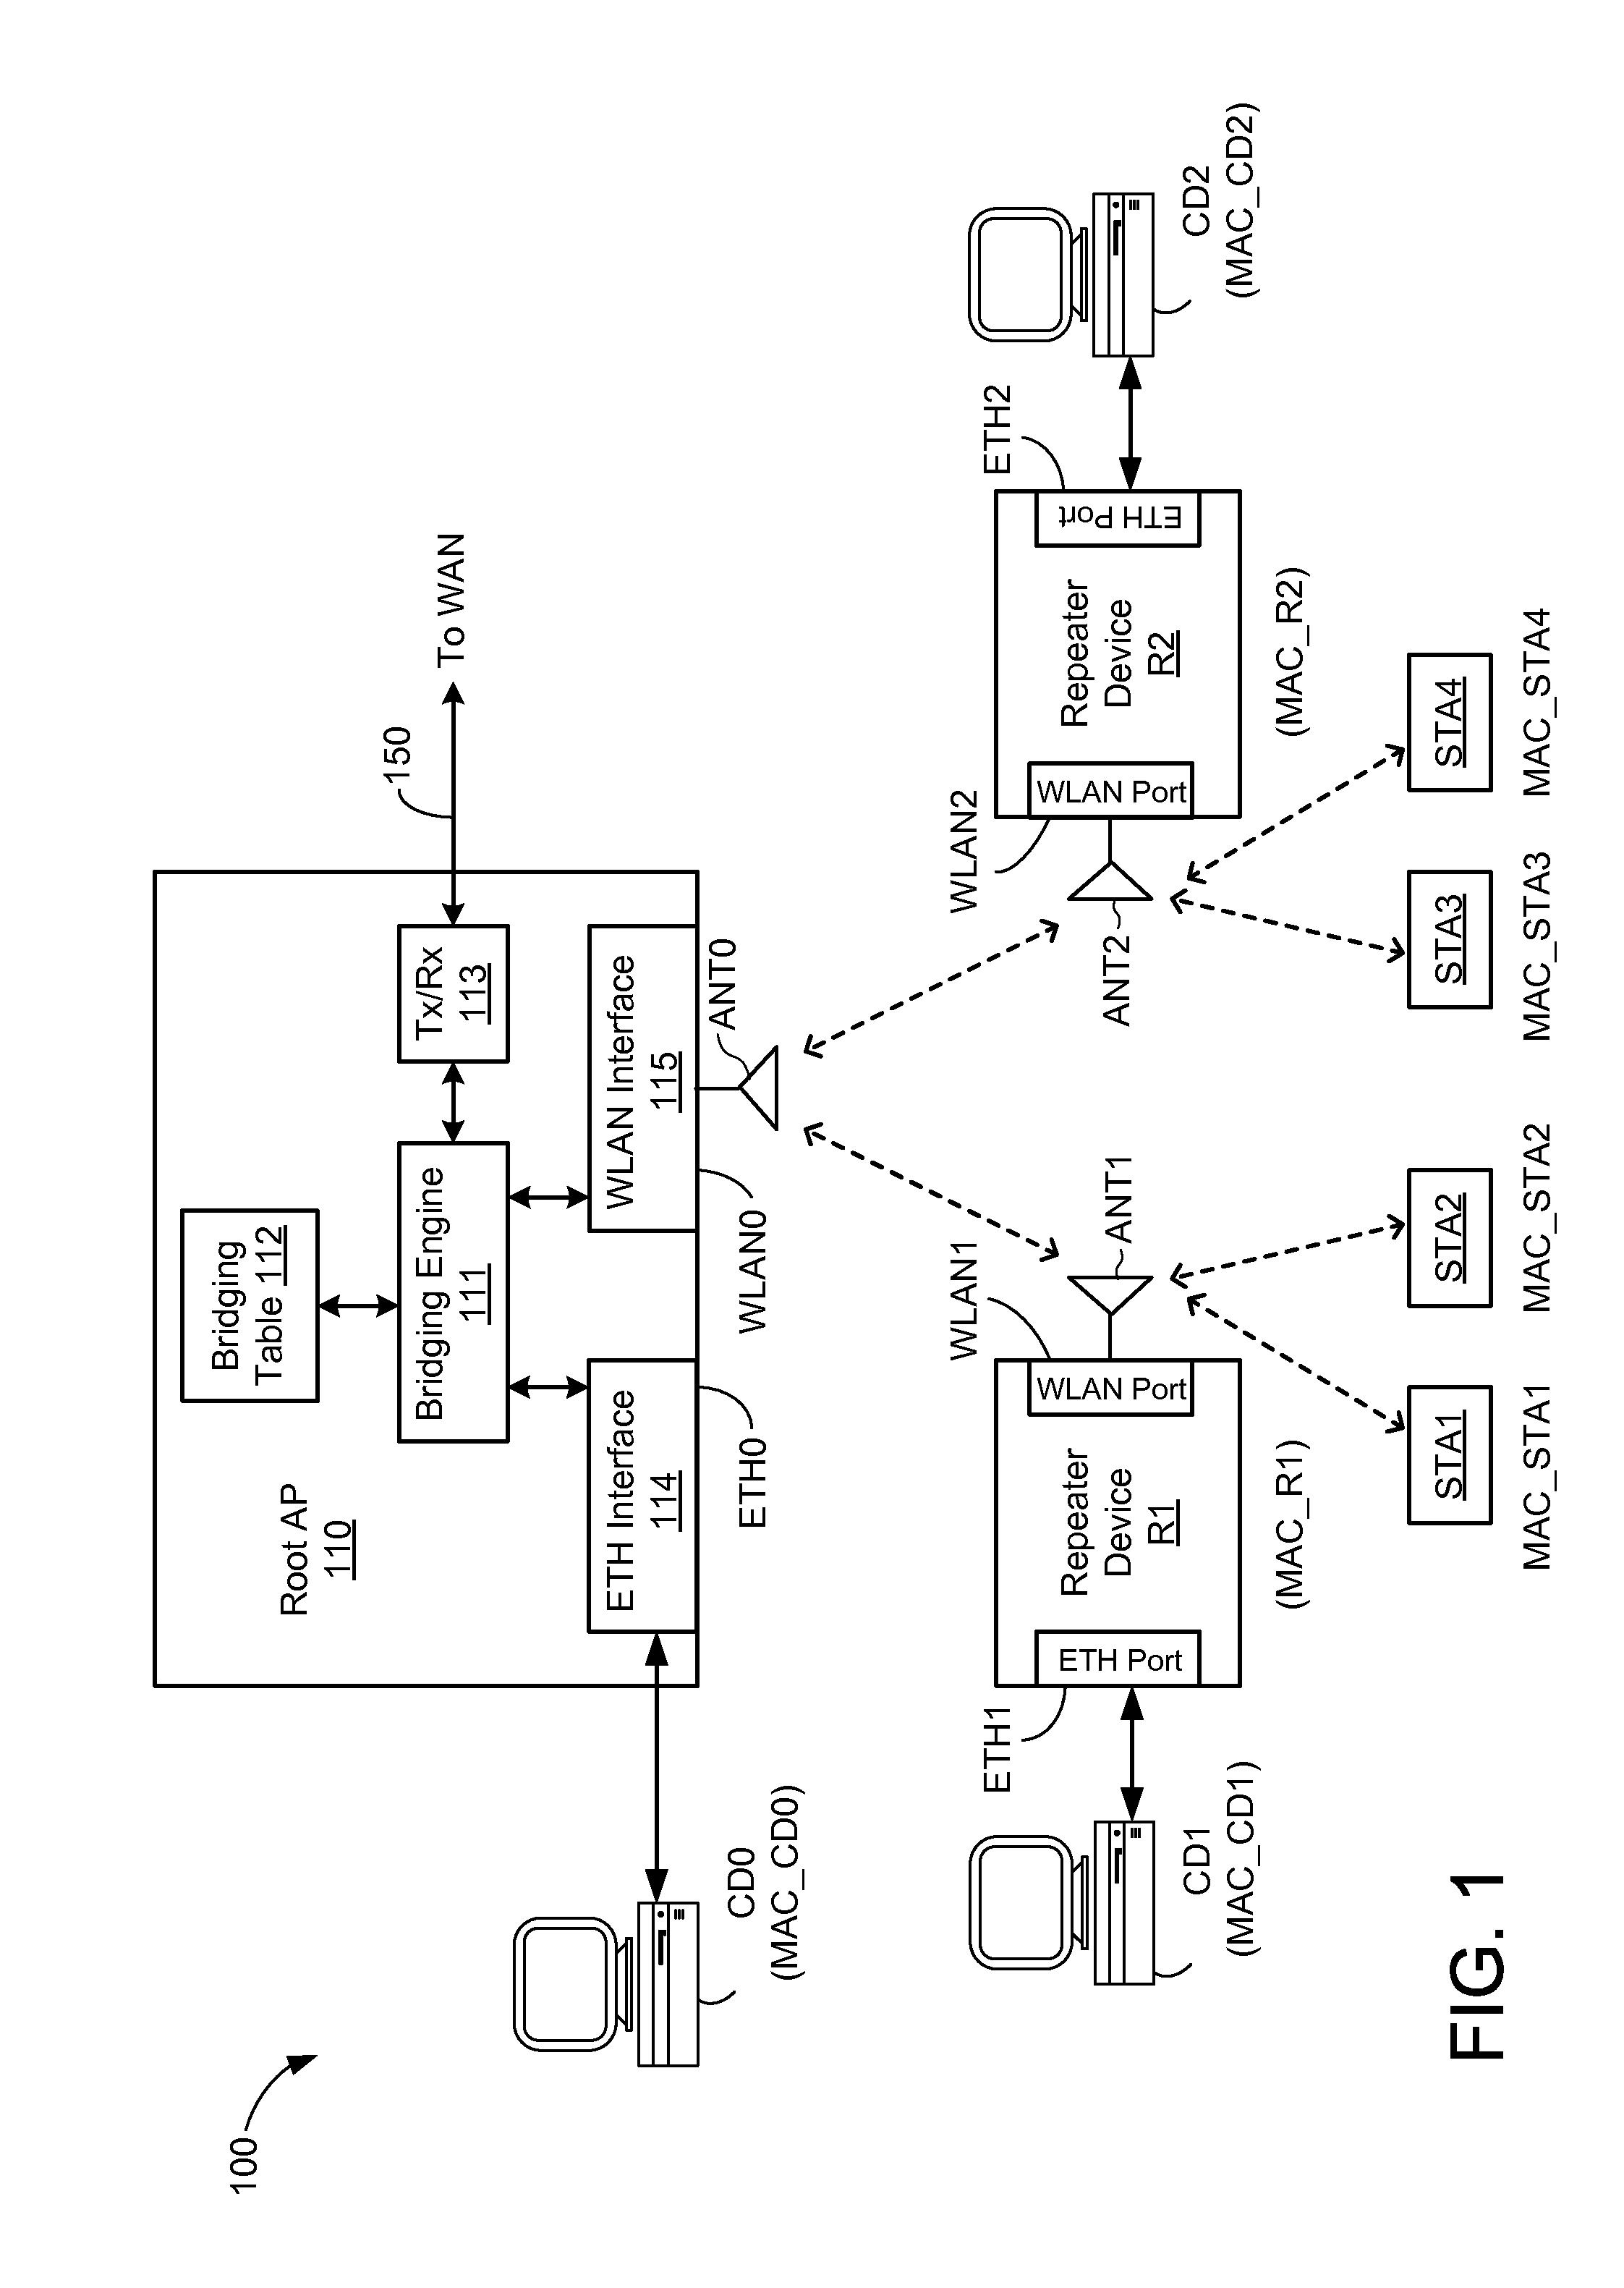 Patent Us20140177513 Shared Media Bridging Google Patents R2 Engine Diagram Drawing